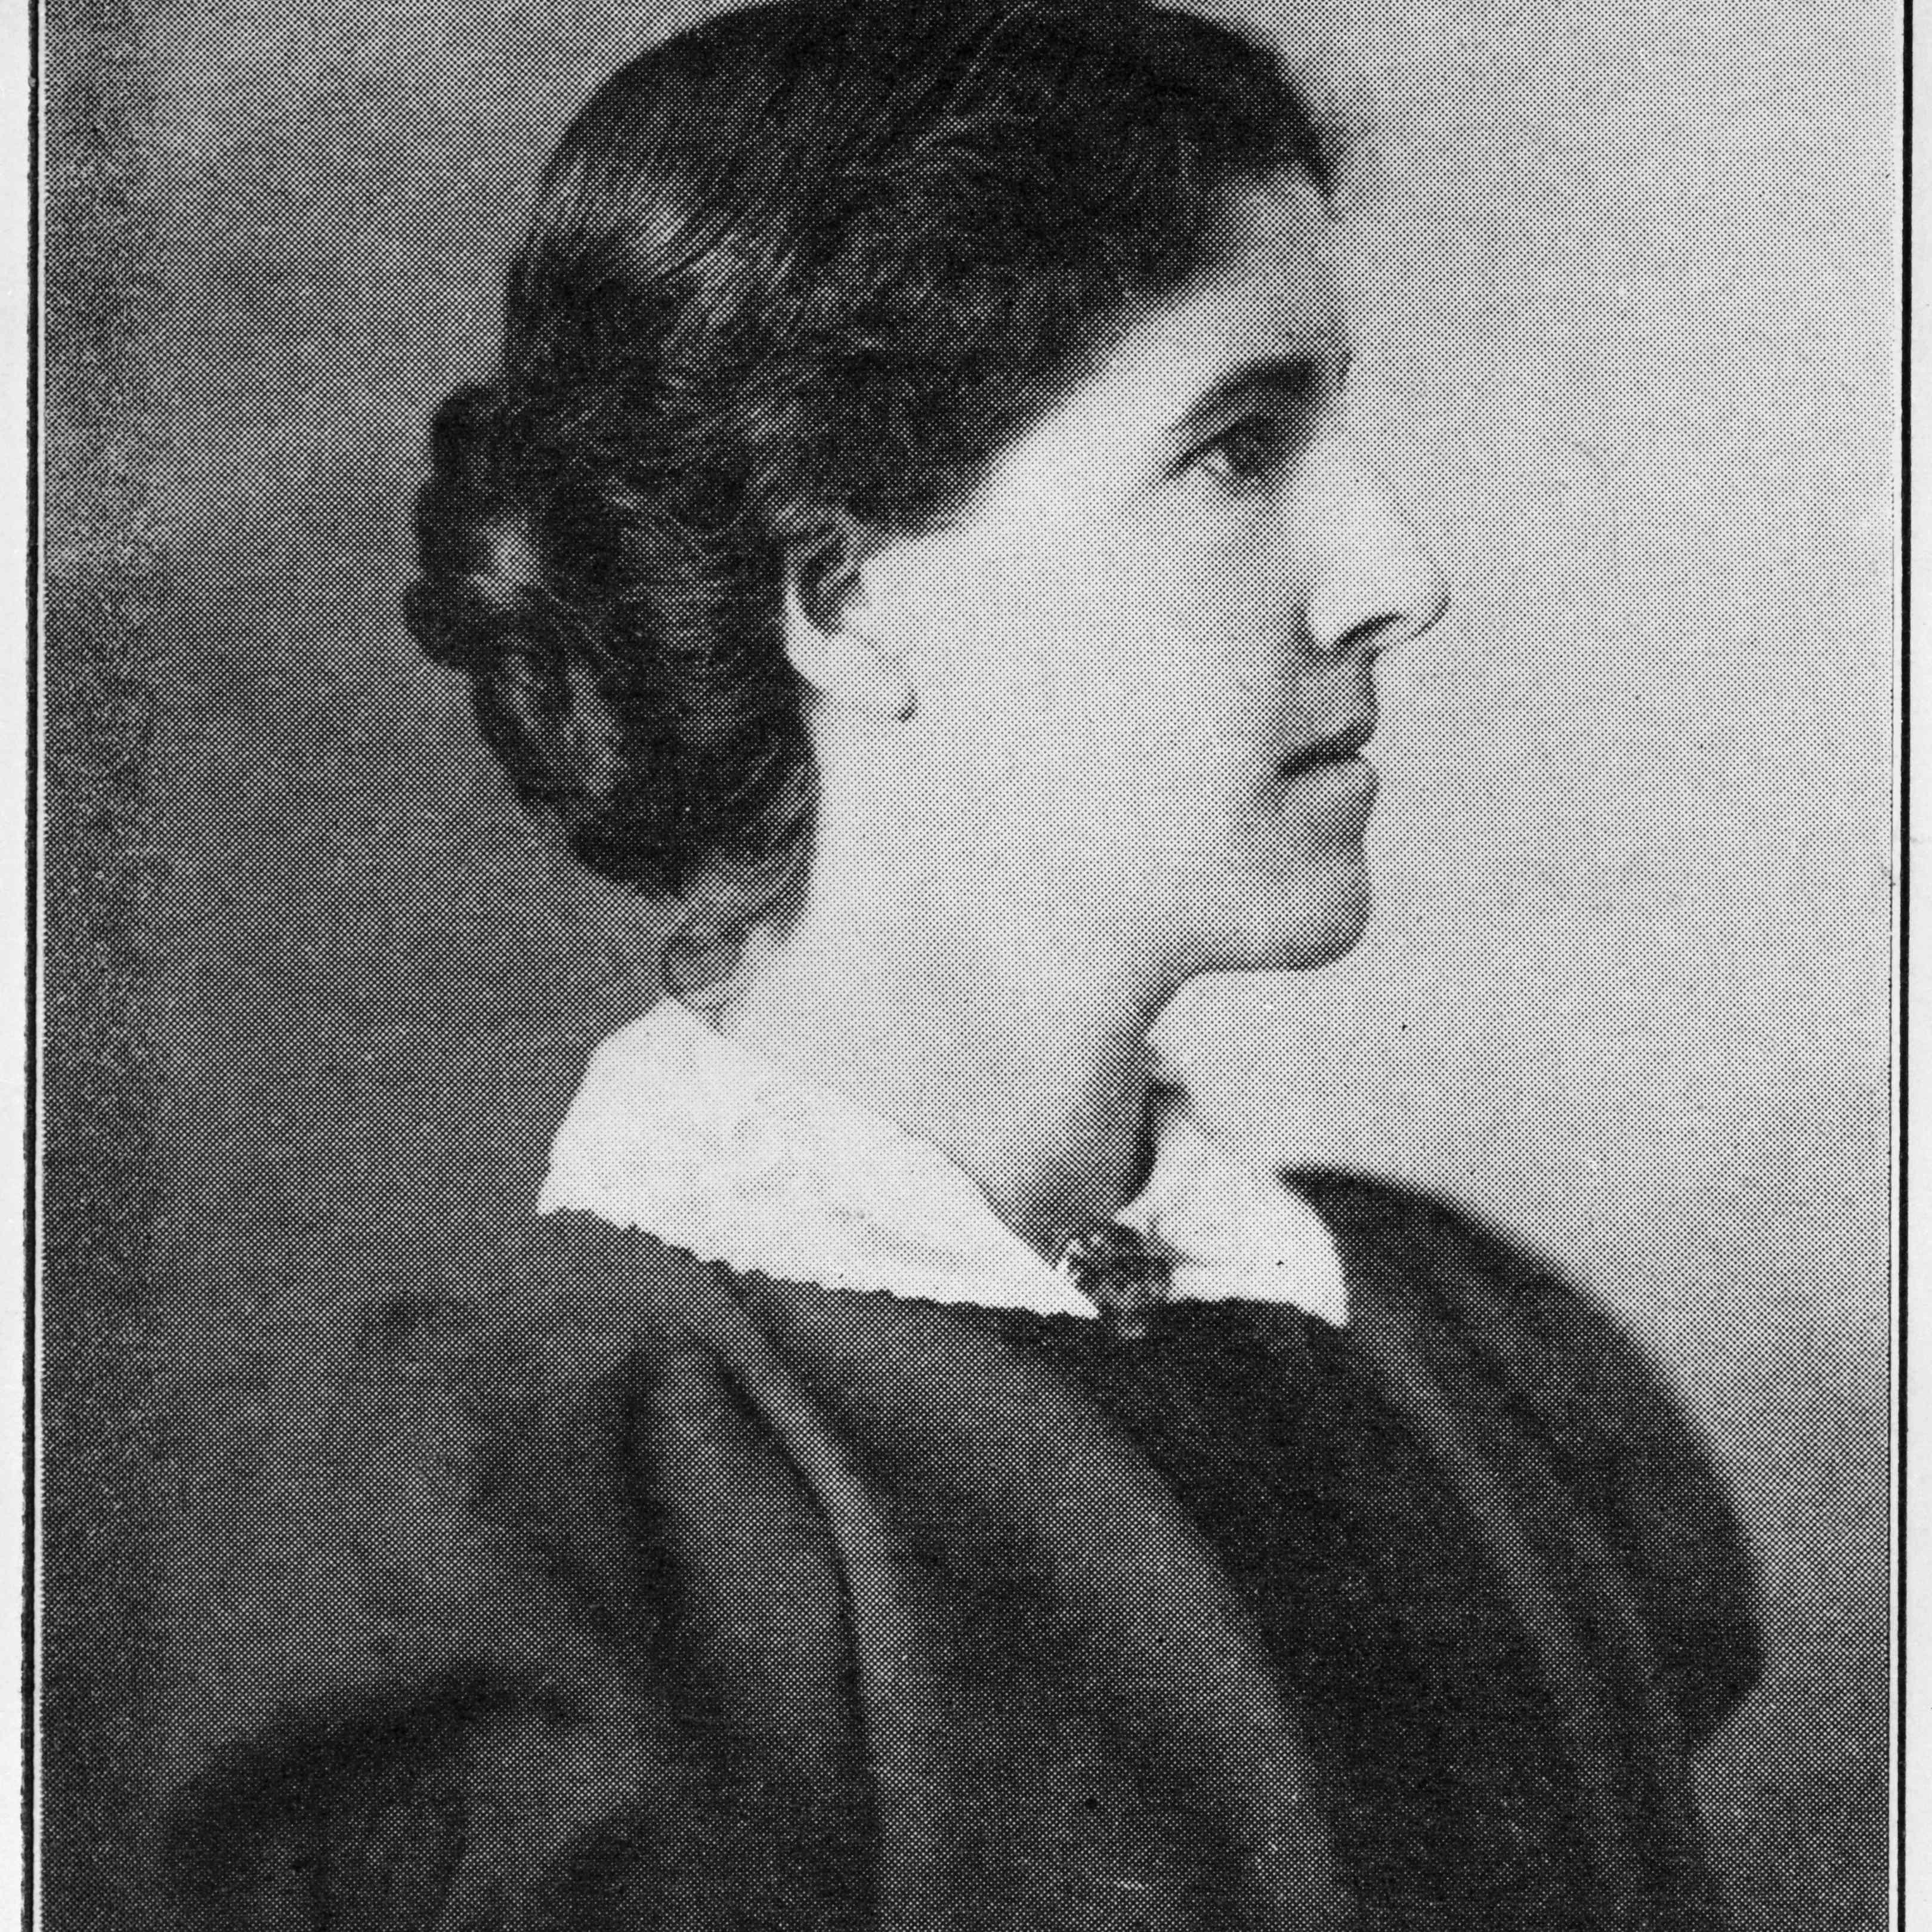 Profile portrait of Charlotte Perkins Gilman